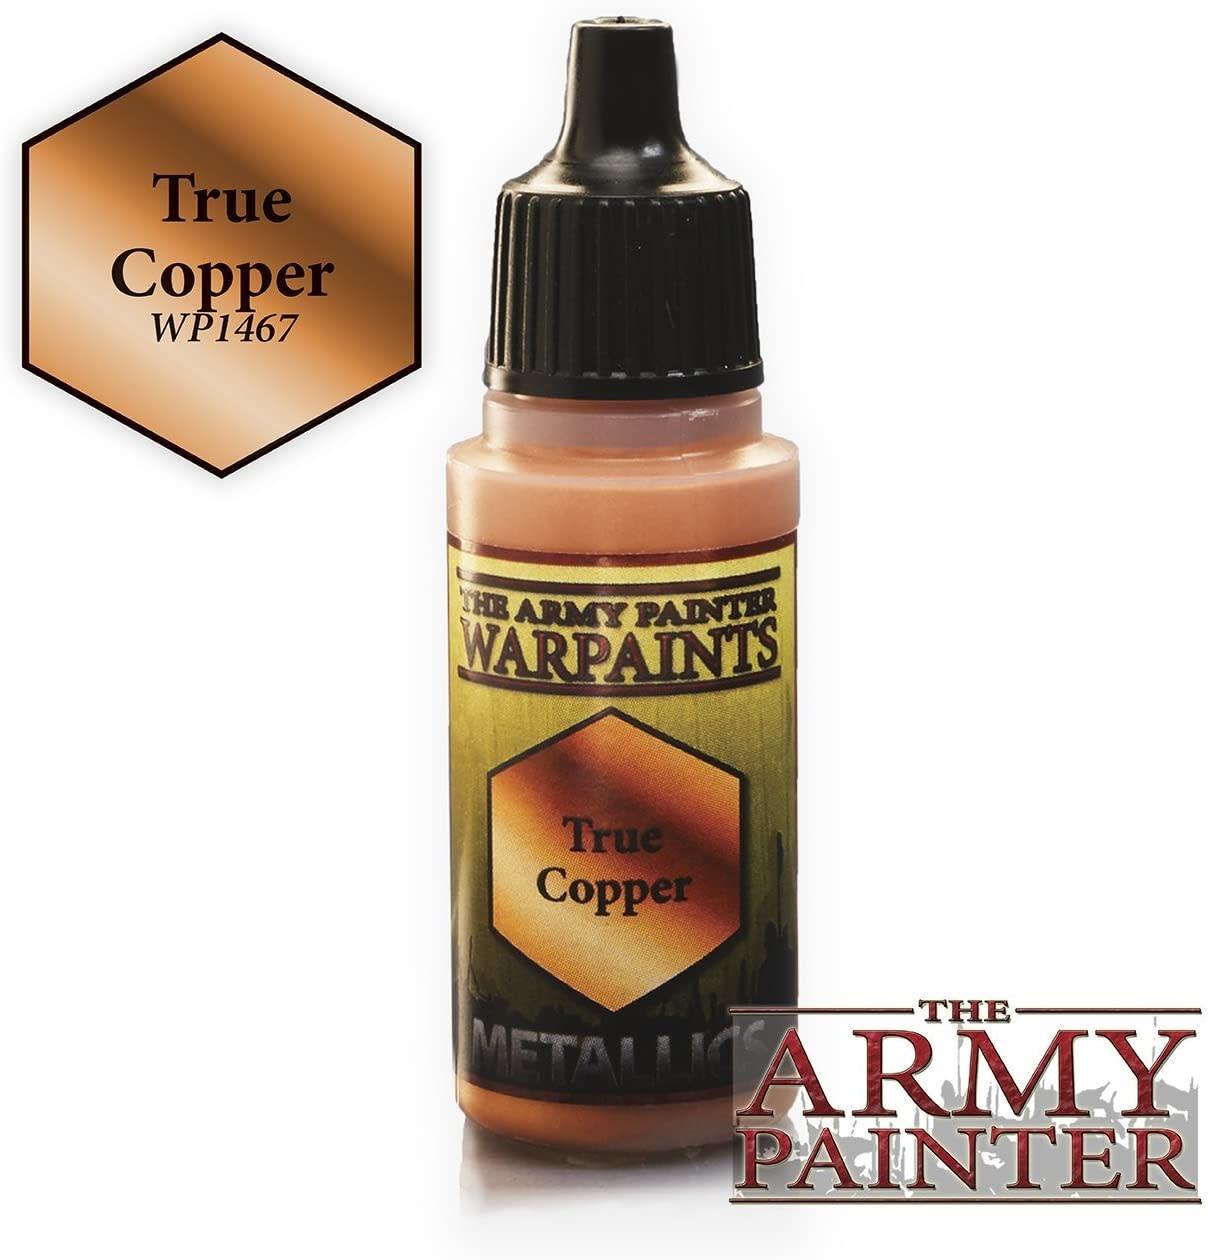 Army Painter Paint 18Ml. True Copper